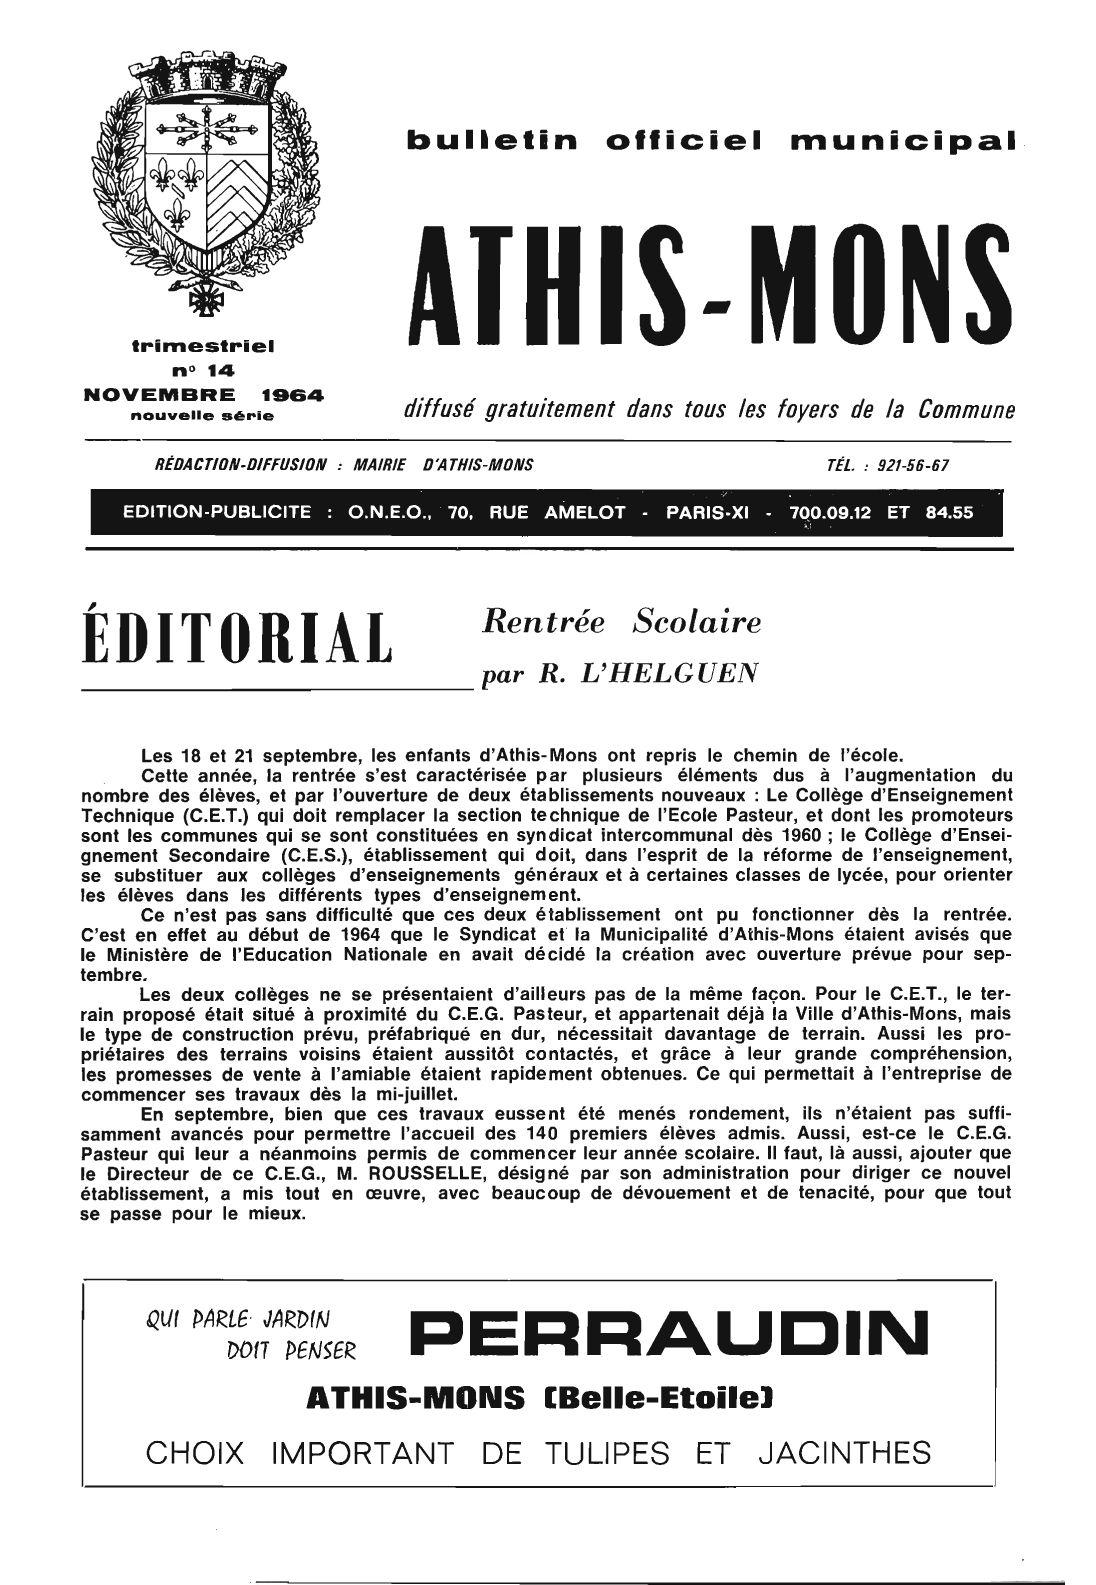 bulletin officiel municipal d 39 athis mons n 14 novembre 1964 by karim loz s issuu. Black Bedroom Furniture Sets. Home Design Ideas